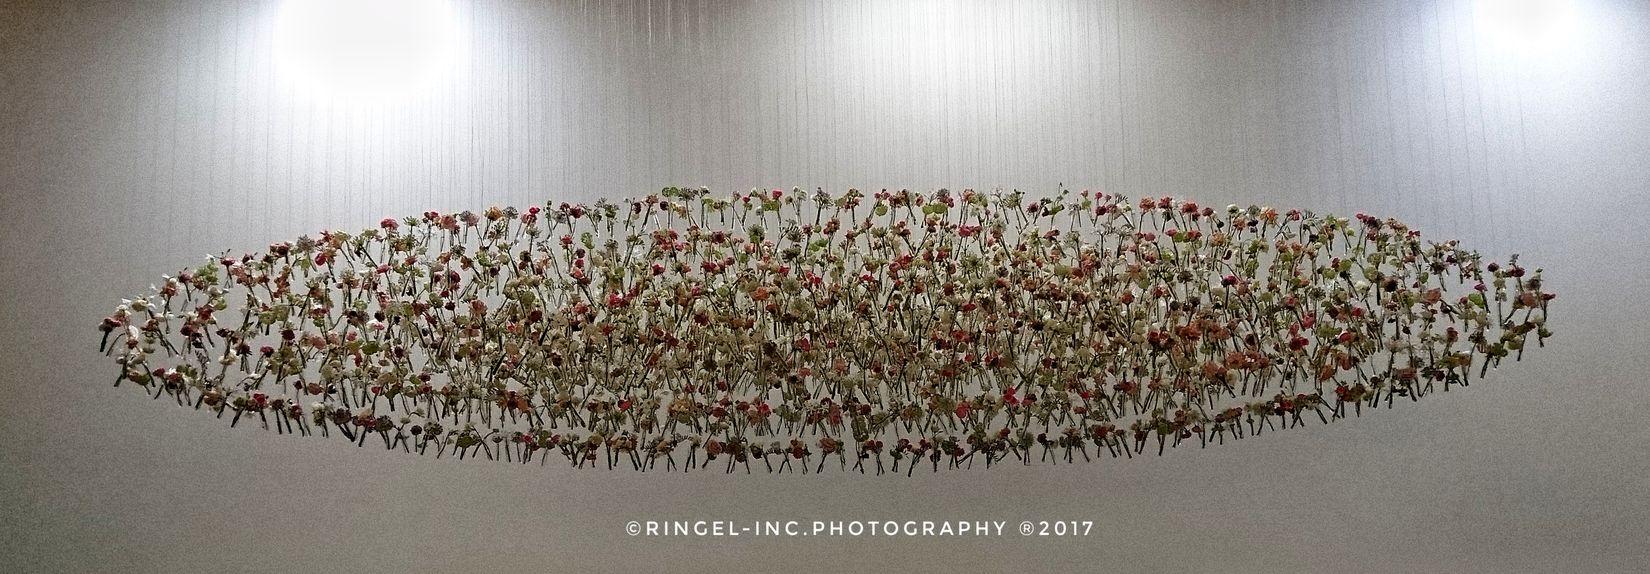 Flying flowers. Illuminated Hanging Out Nature Fooling Around ^_^ Taking Photos Enjoying Life Snapseed Creativity Luxury Hello World Getting Inspired